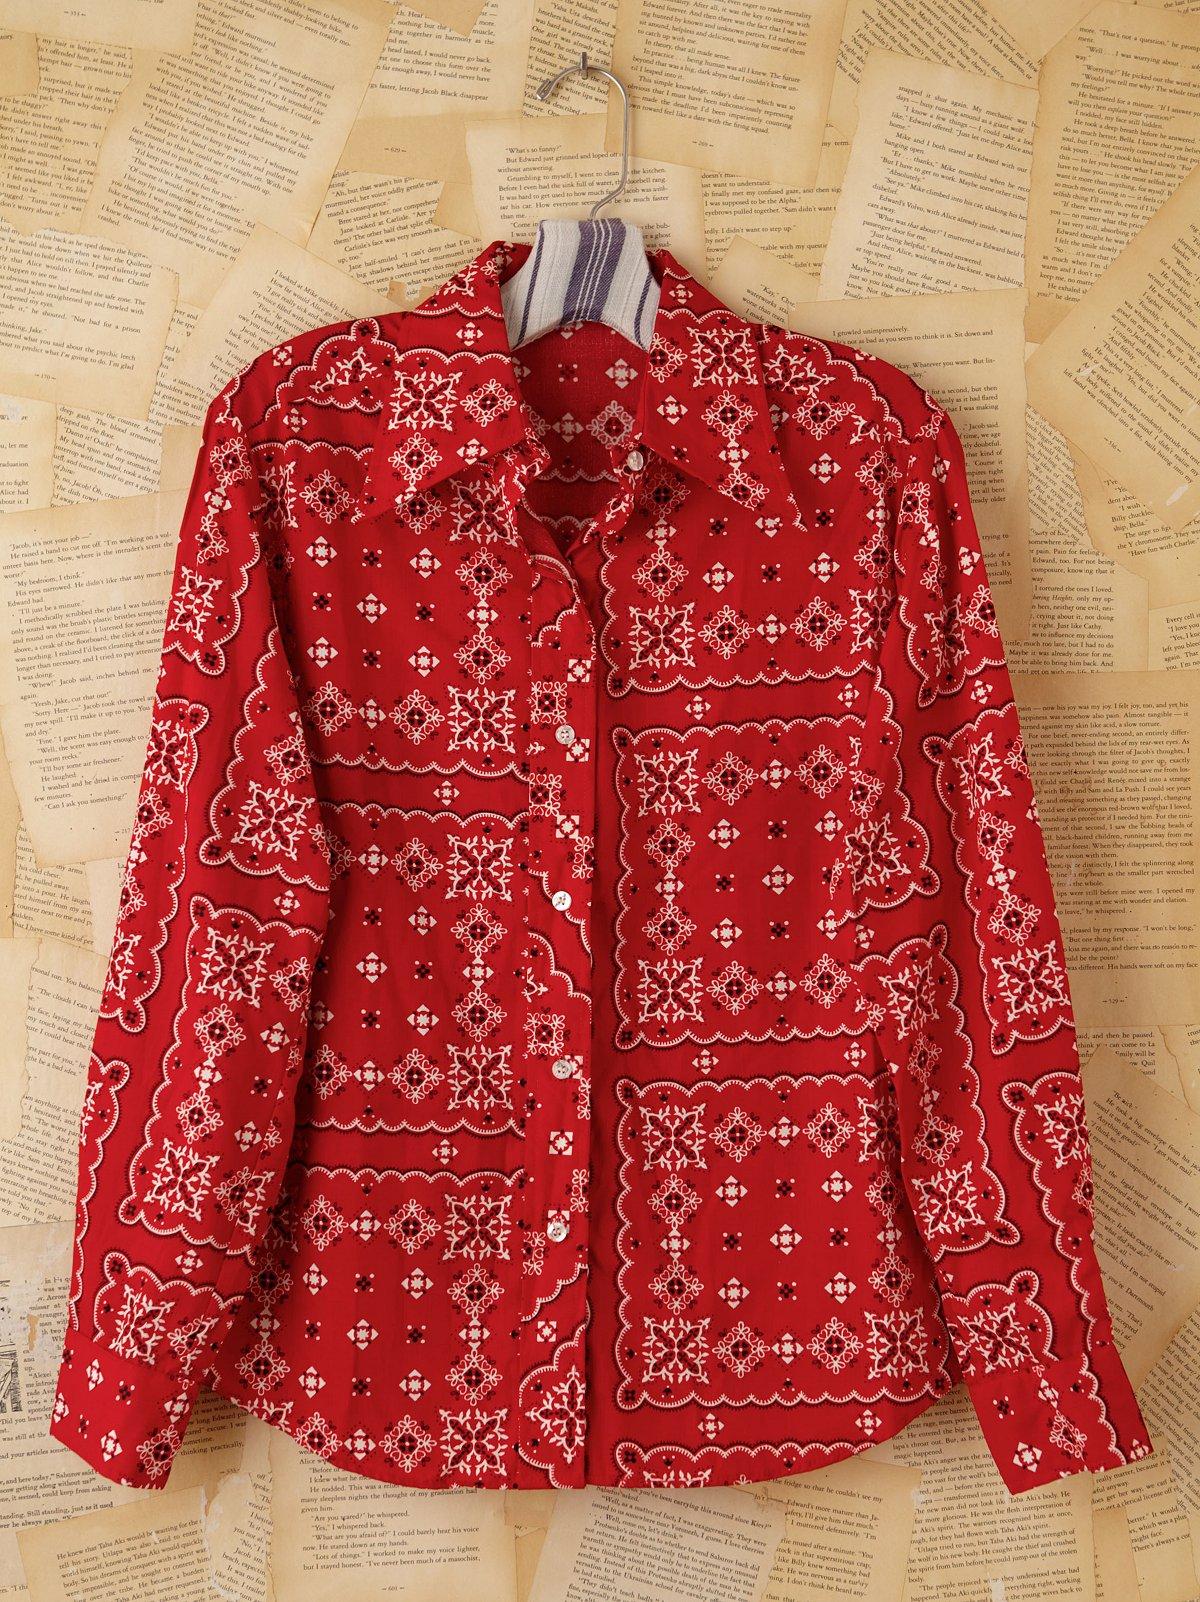 Vintage Red Bandana Printed Top